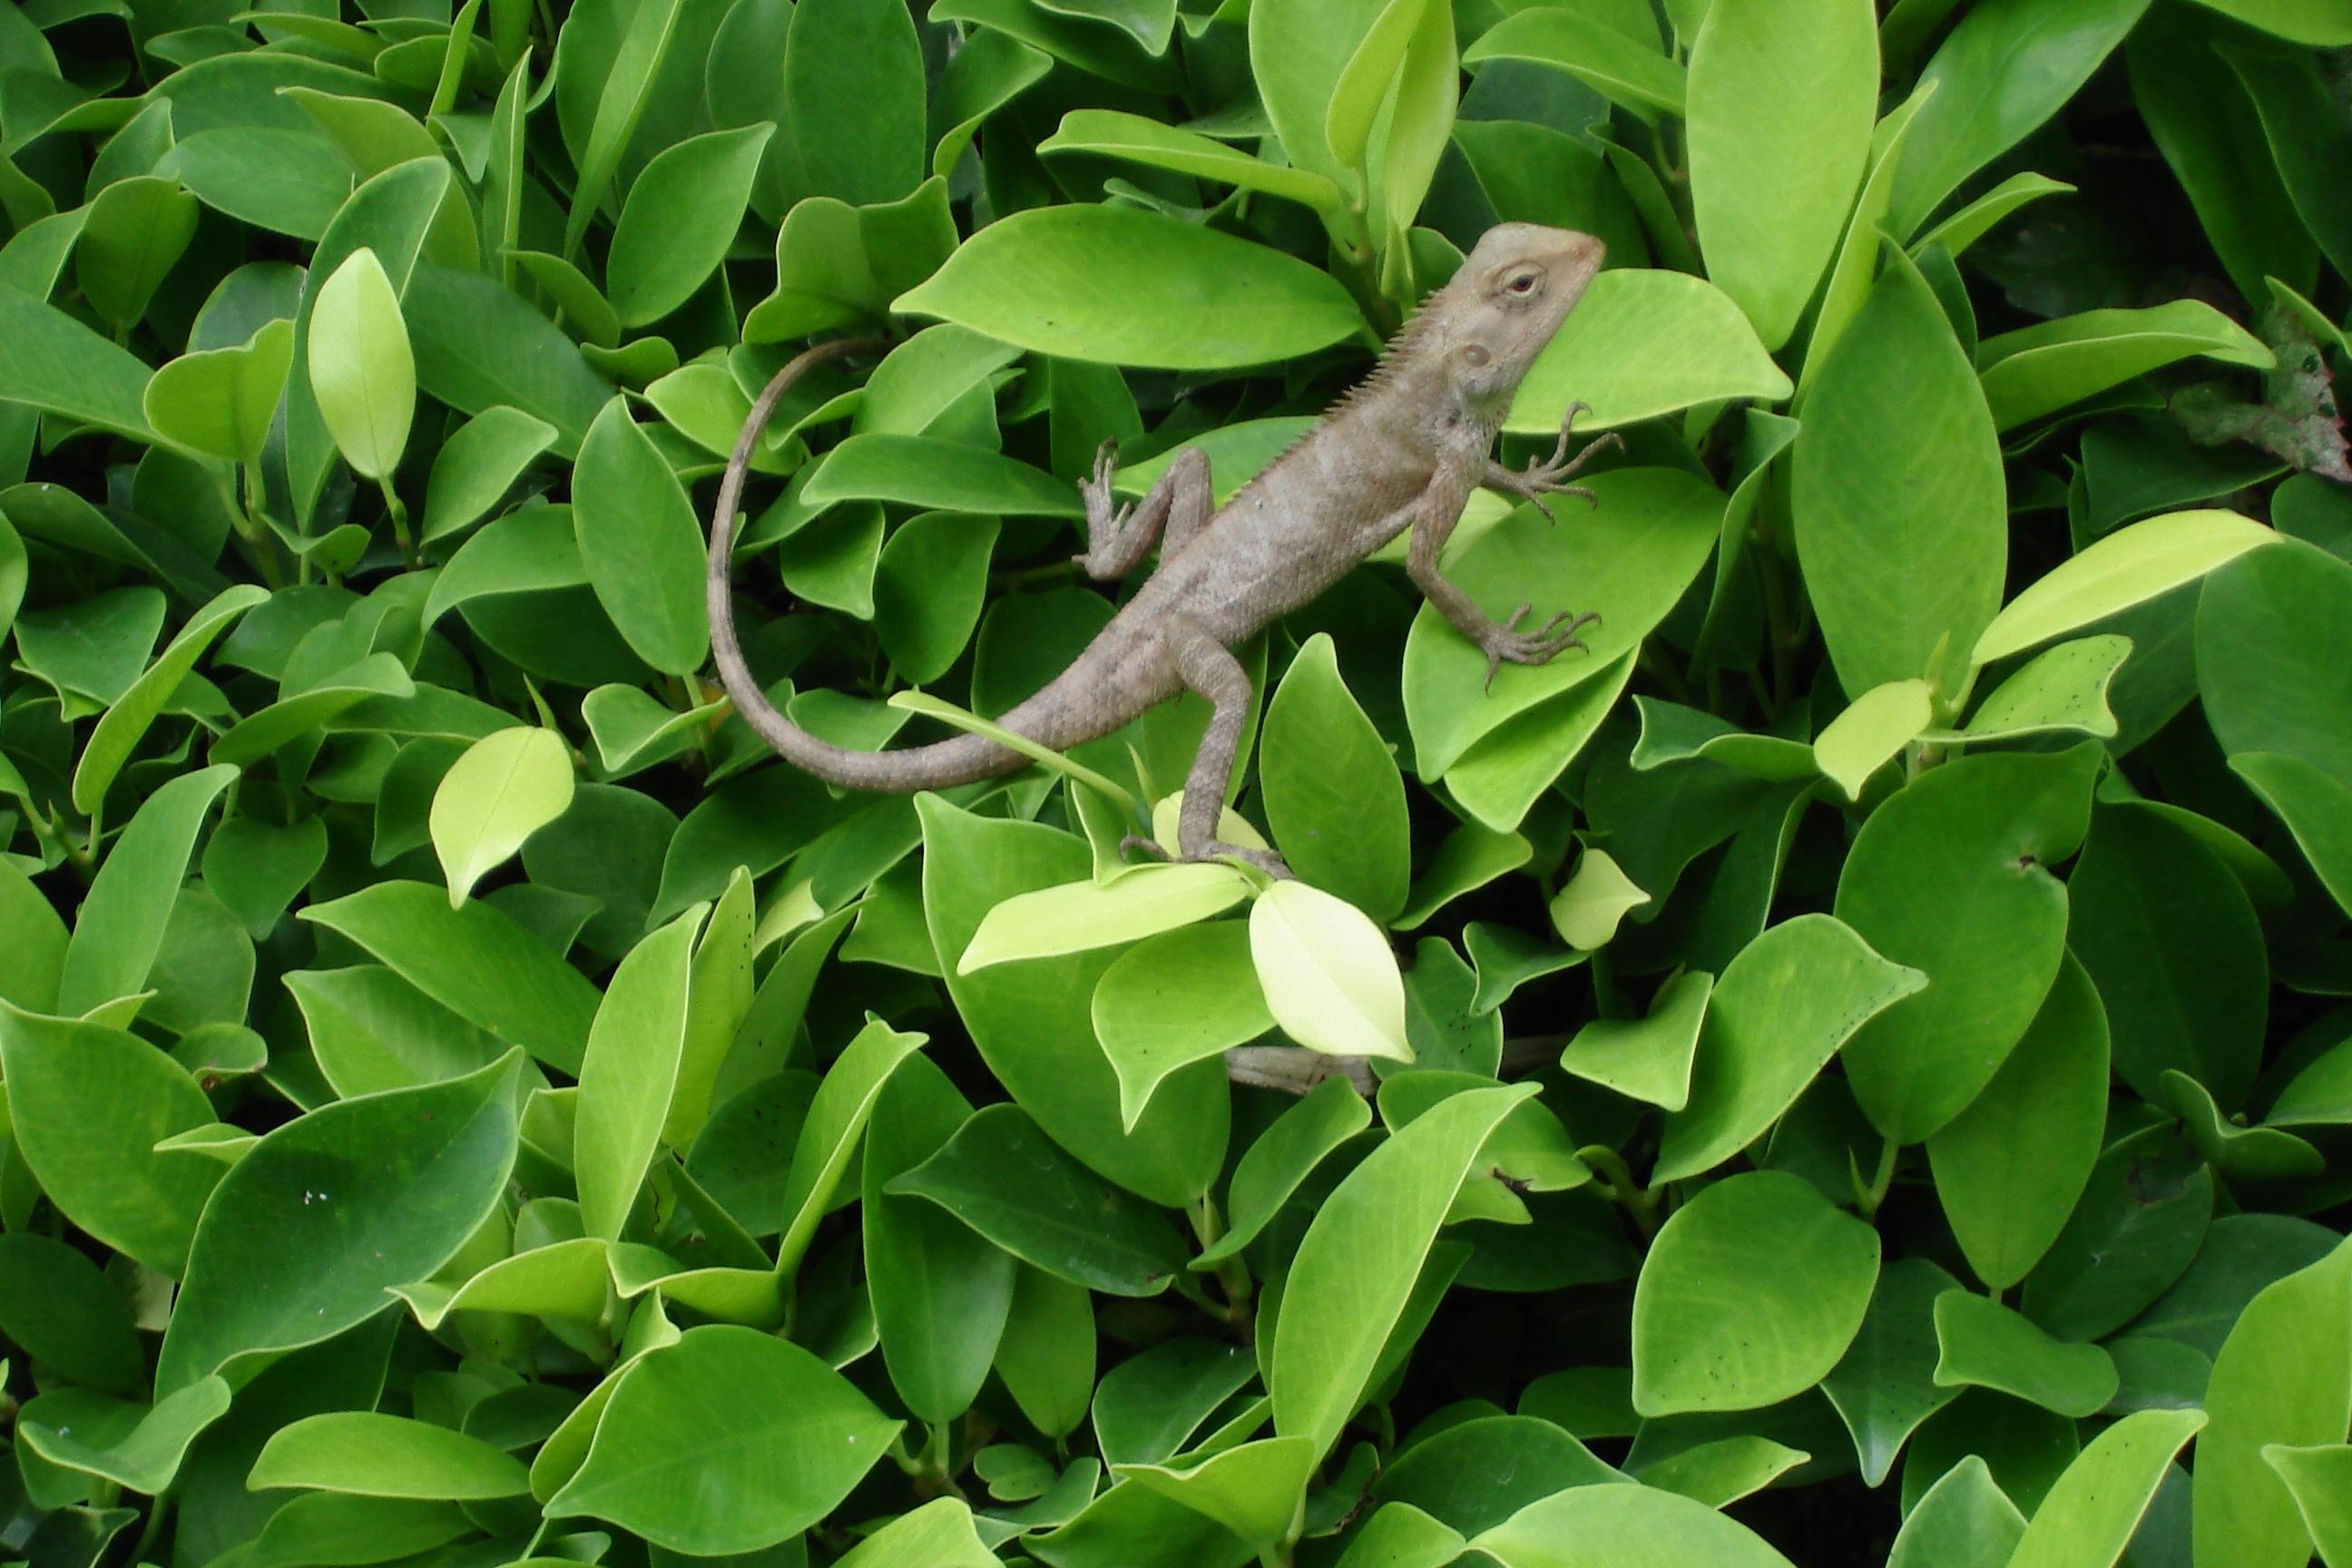 Lizard, Amphibian, Future, Ugliness, Tower, HQ Photo